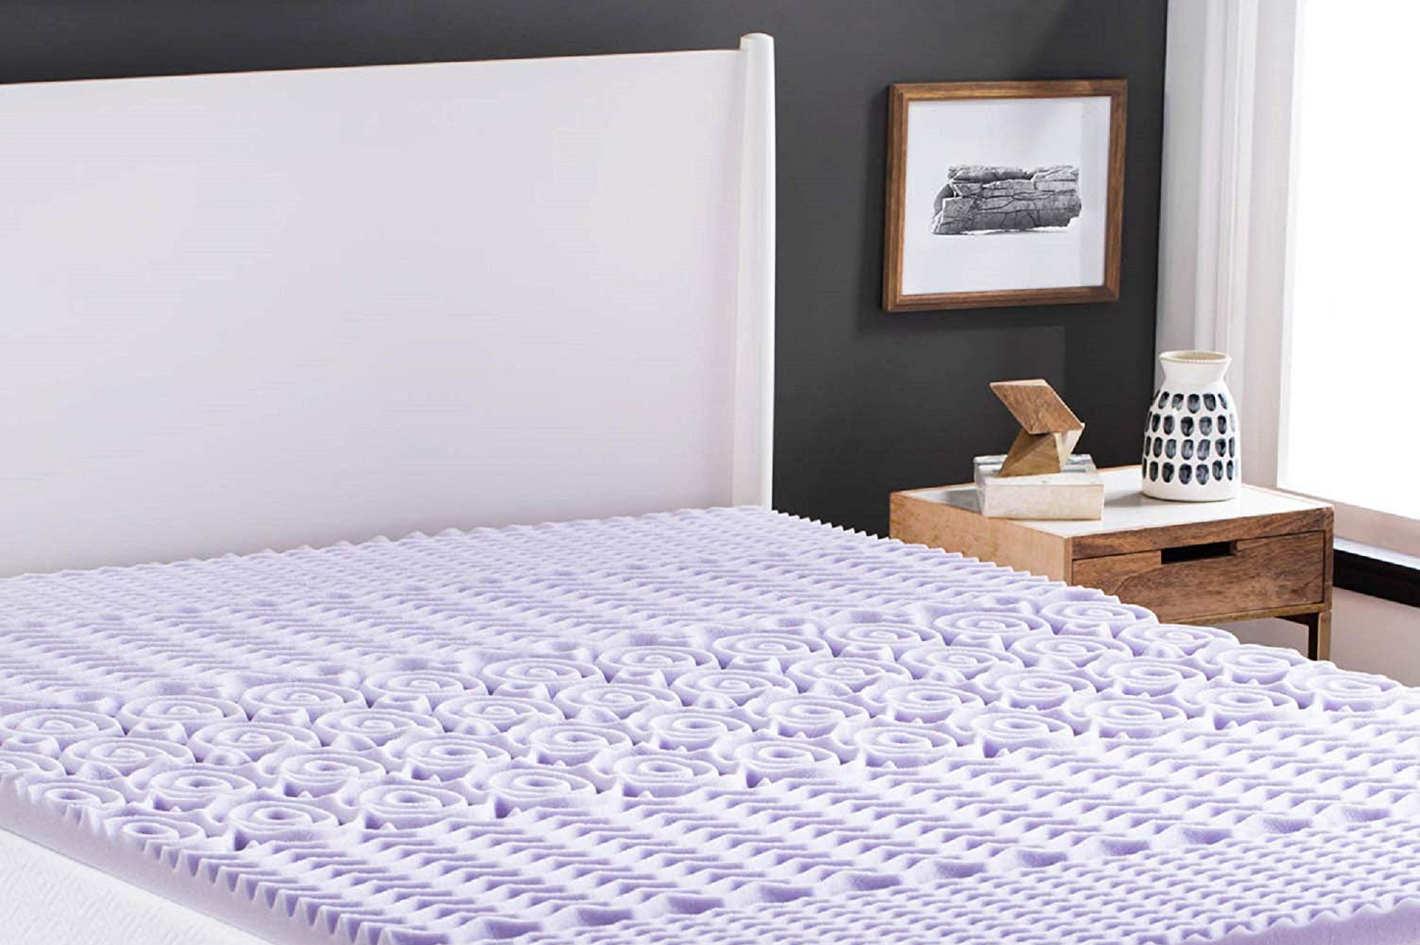 Lucid 2-inch 5-Zone Lavender Memory Foam Mattress Topper